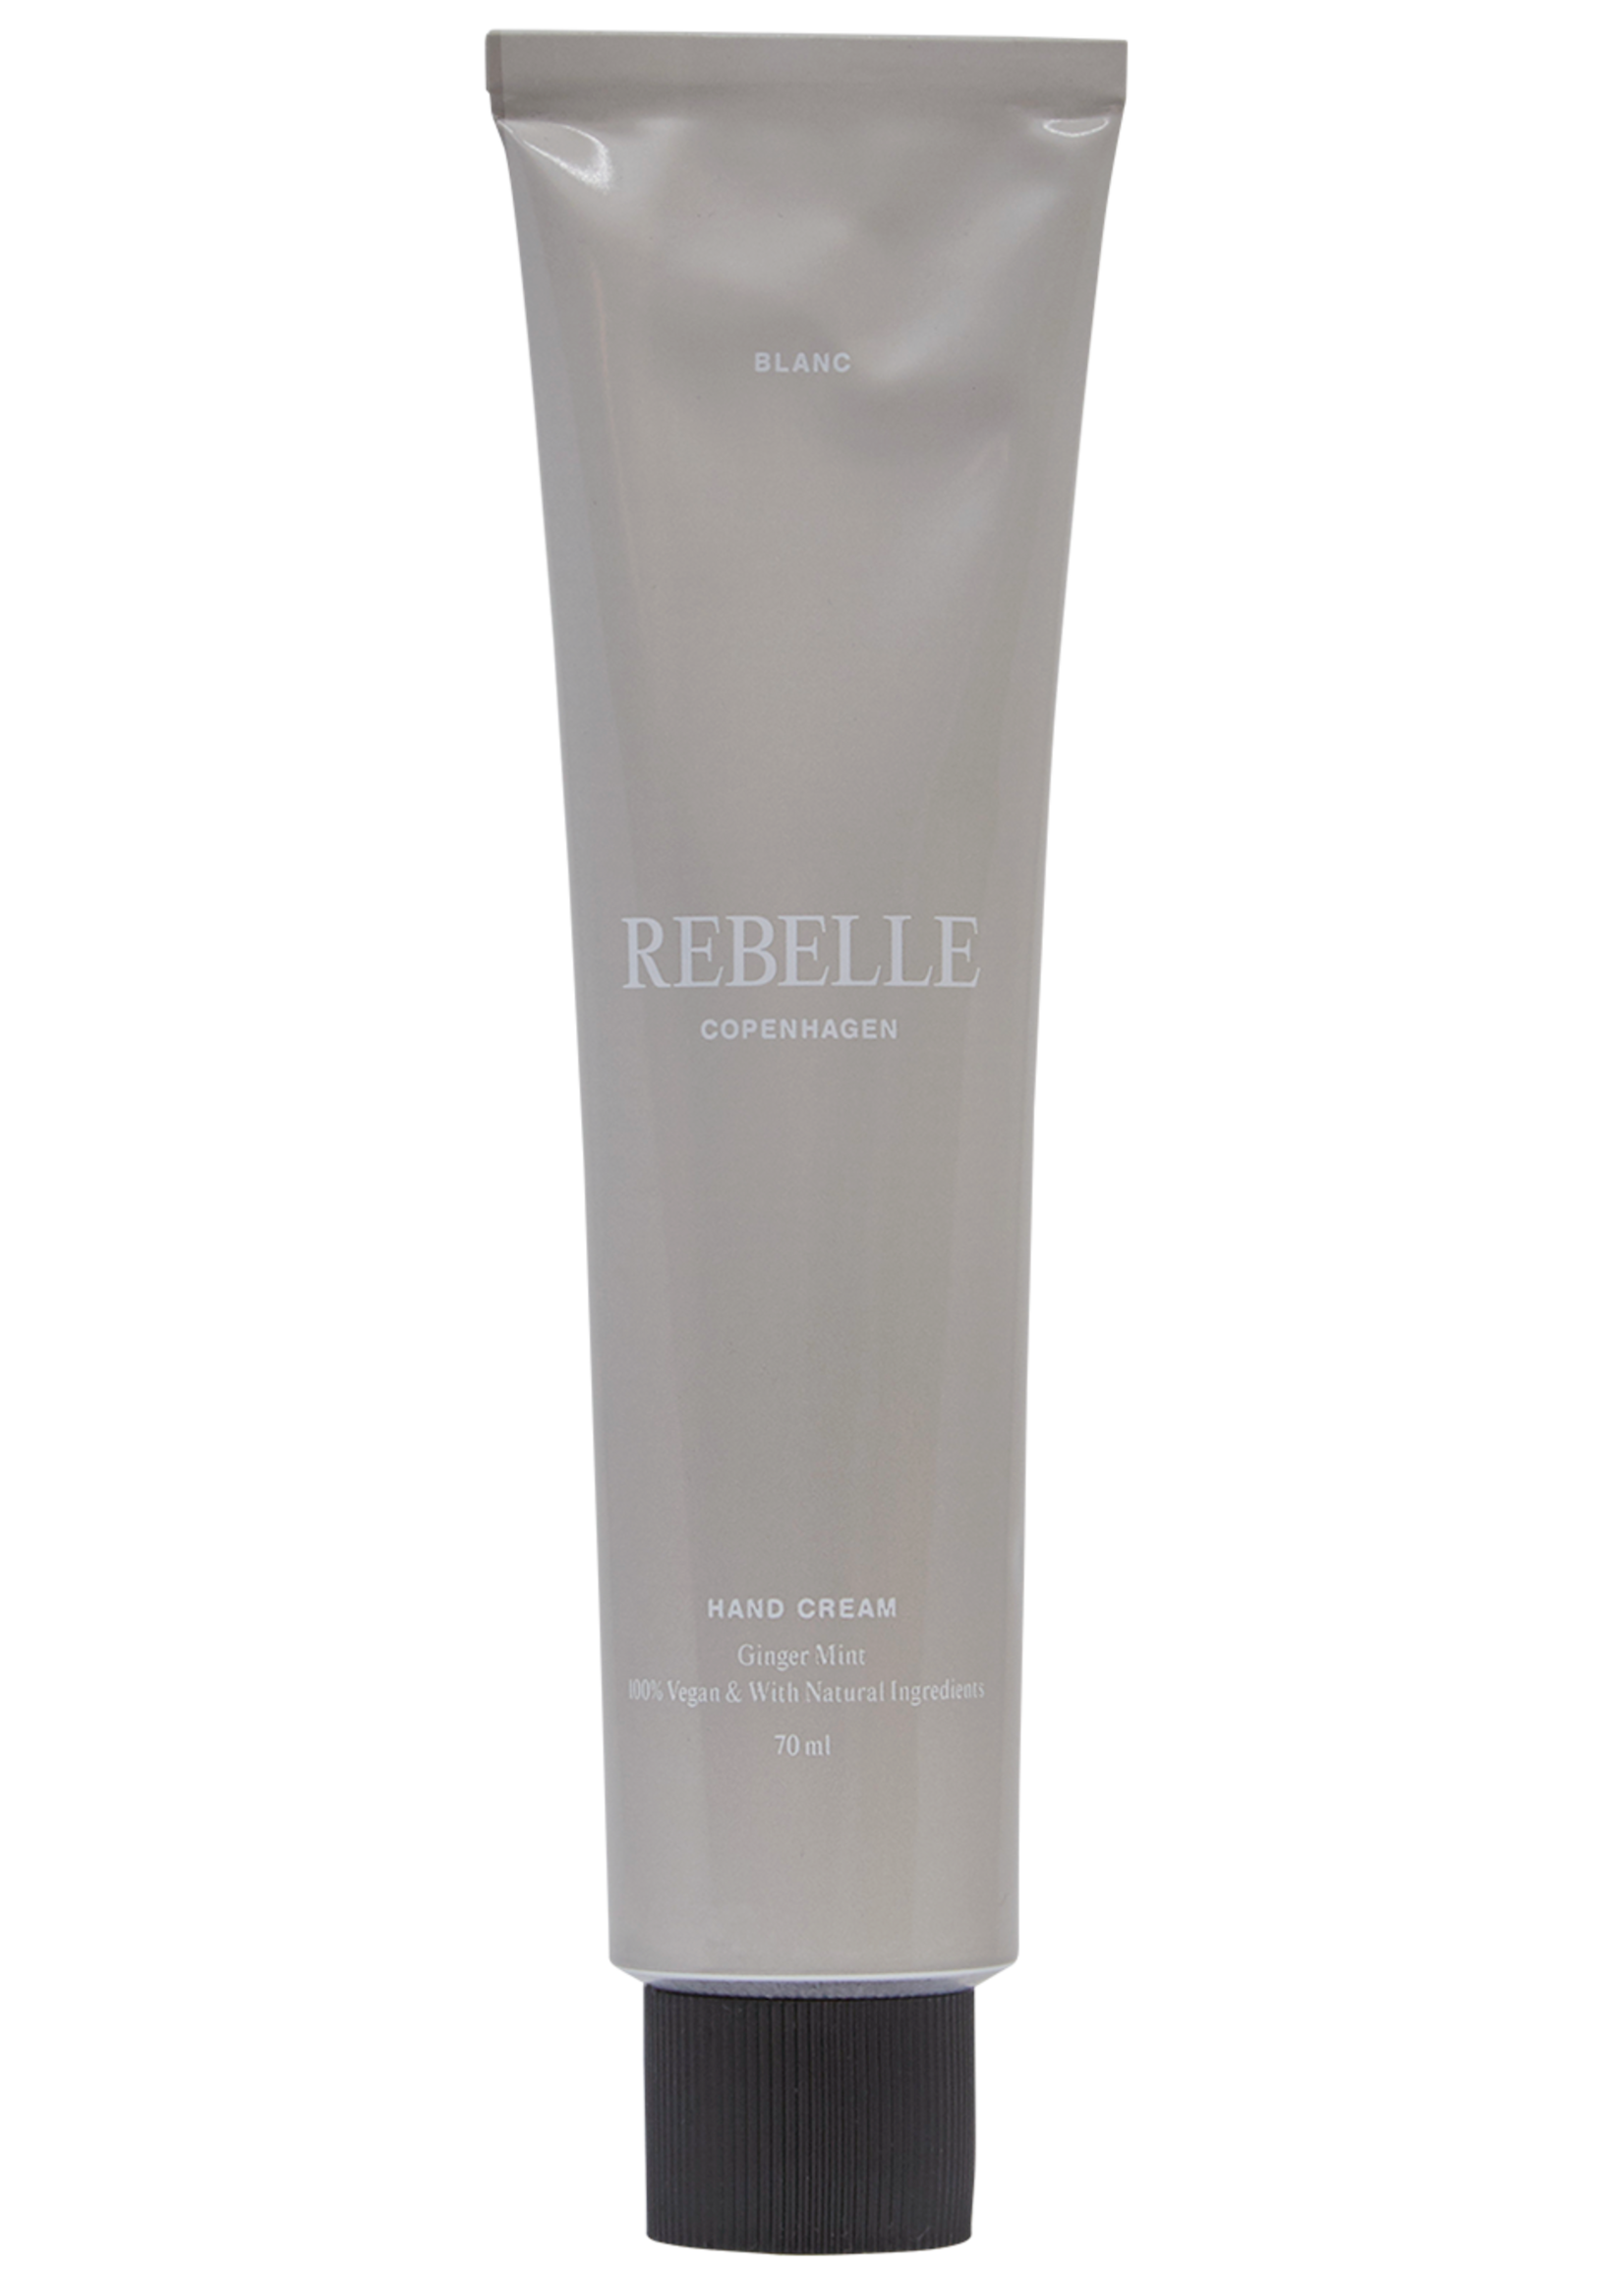 Rebelle Hand Cream